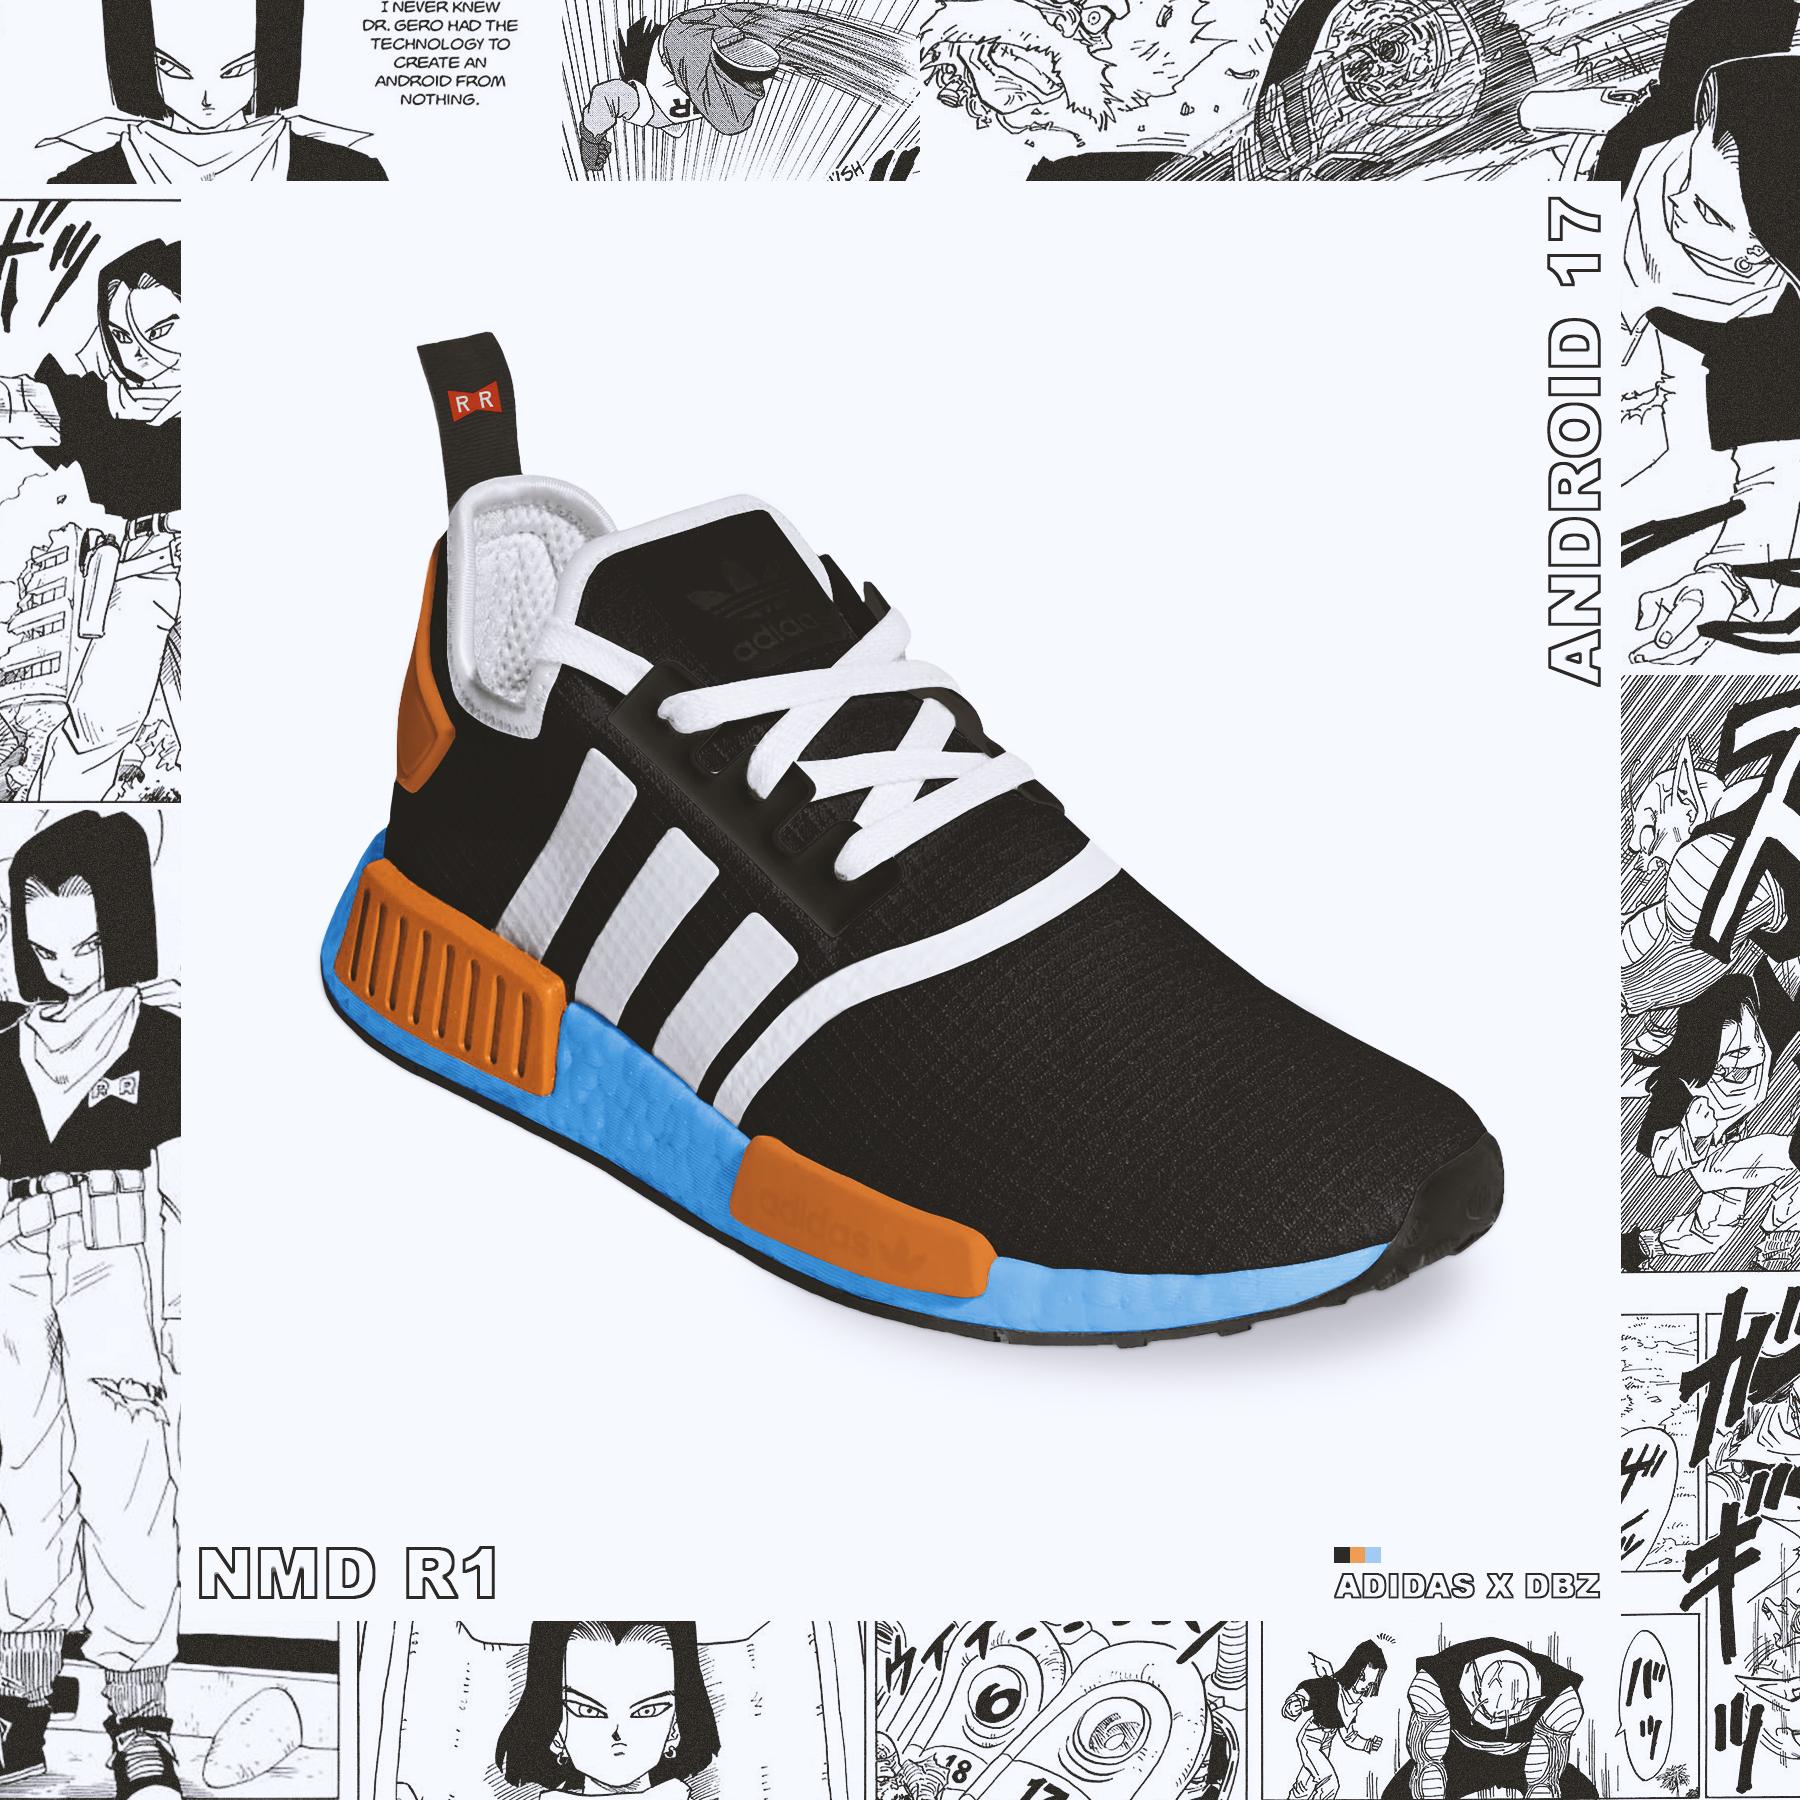 Adidas_17_KevinCarter_01.jpg